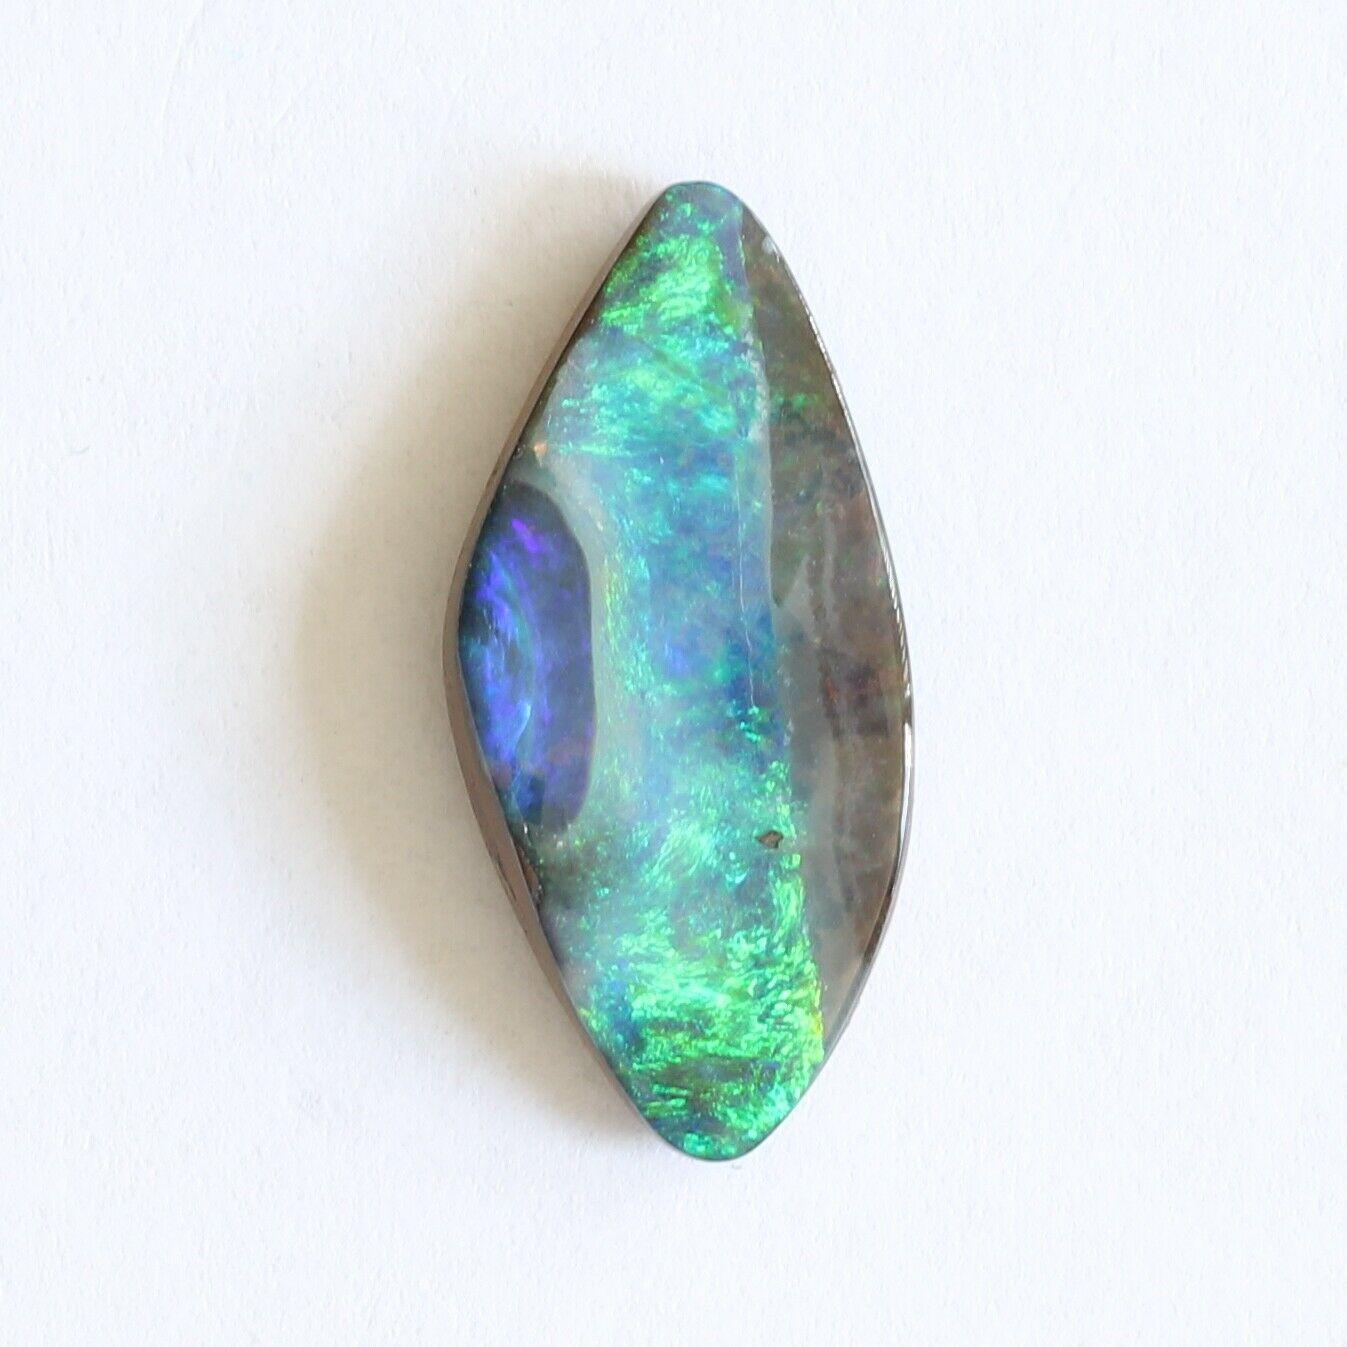 13.51 ct Solid Natural Australian Boulder Opal